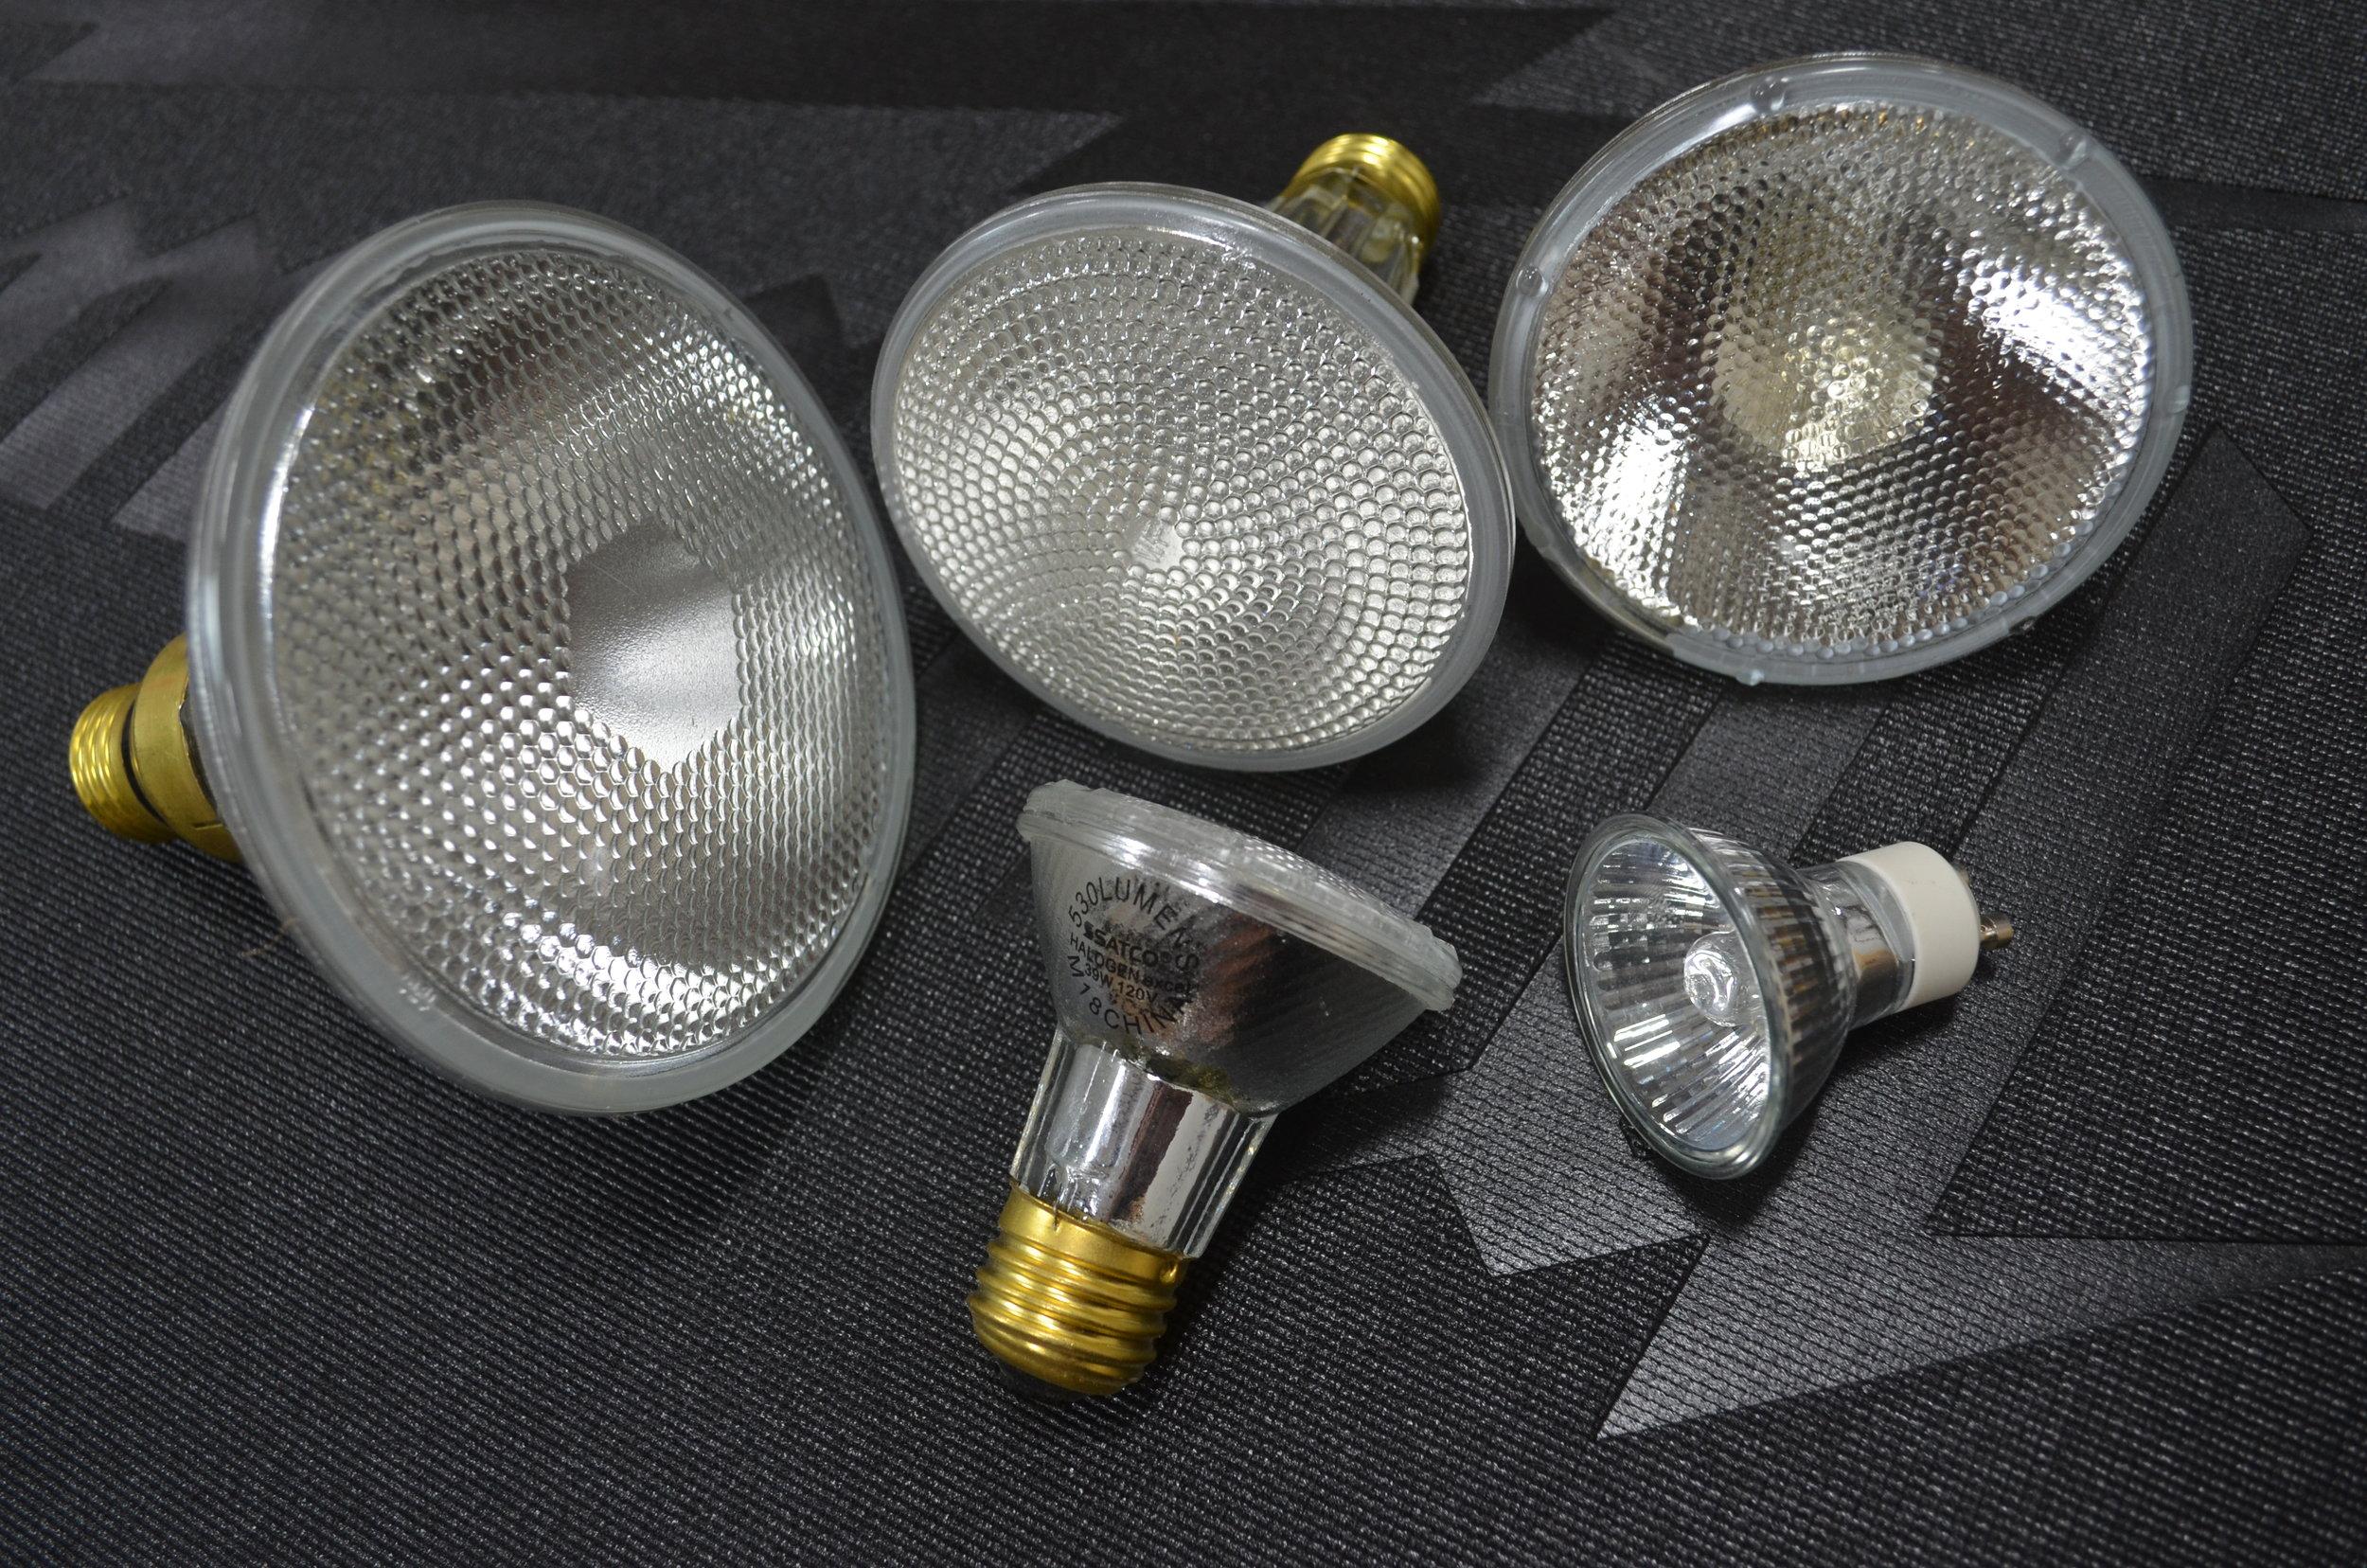 assortment-of-halogen-lamps-bulbs